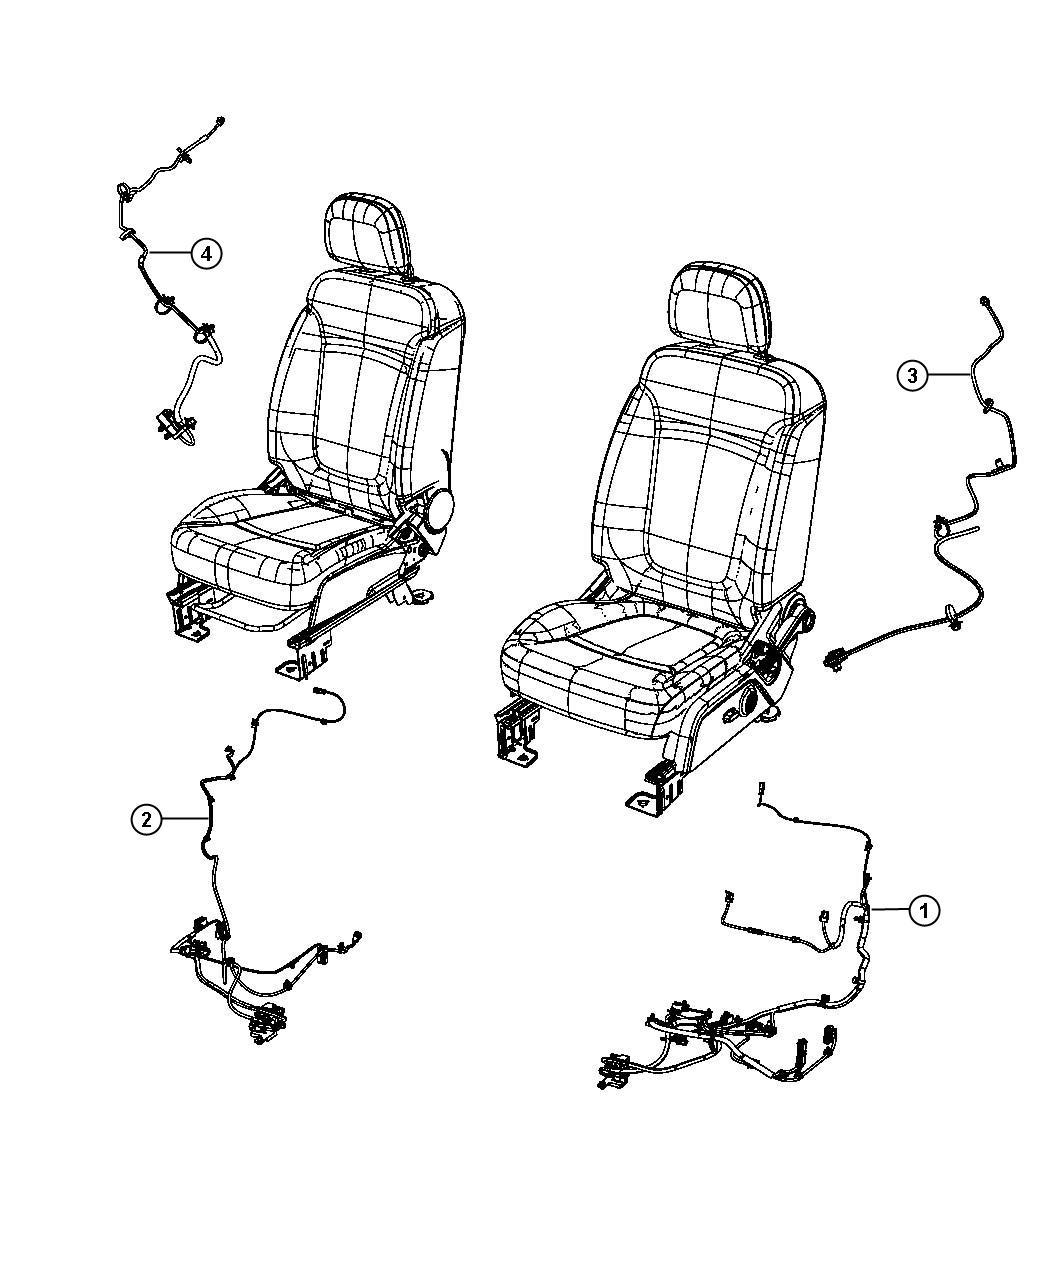 Dodge Journey Wiring Power Seat Seat Export Trim